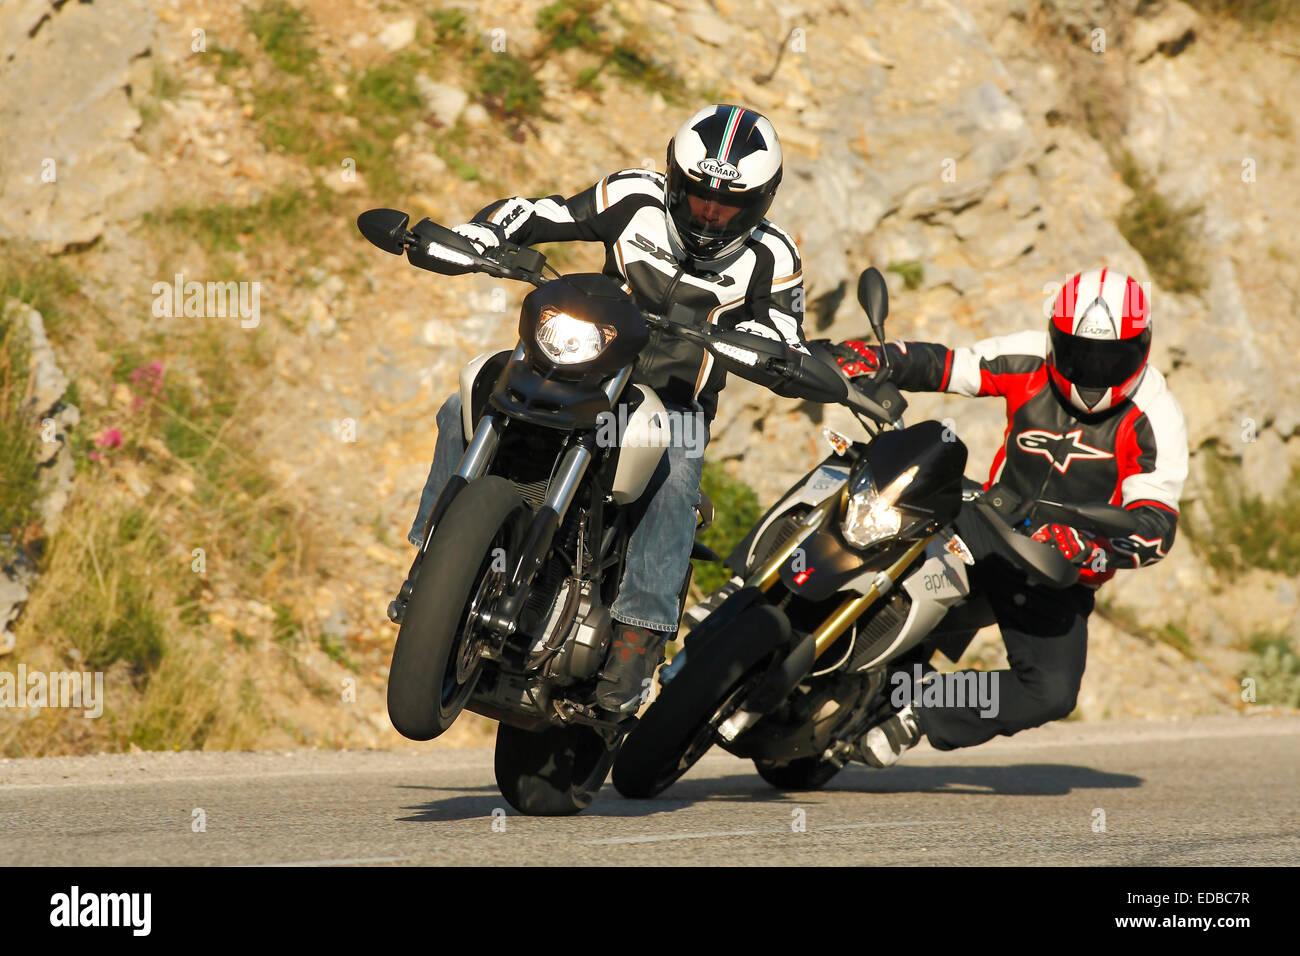 Motorcycles, Ducati Hypermotard 796, Aprilia Dorsoduro, driving - Stock Image